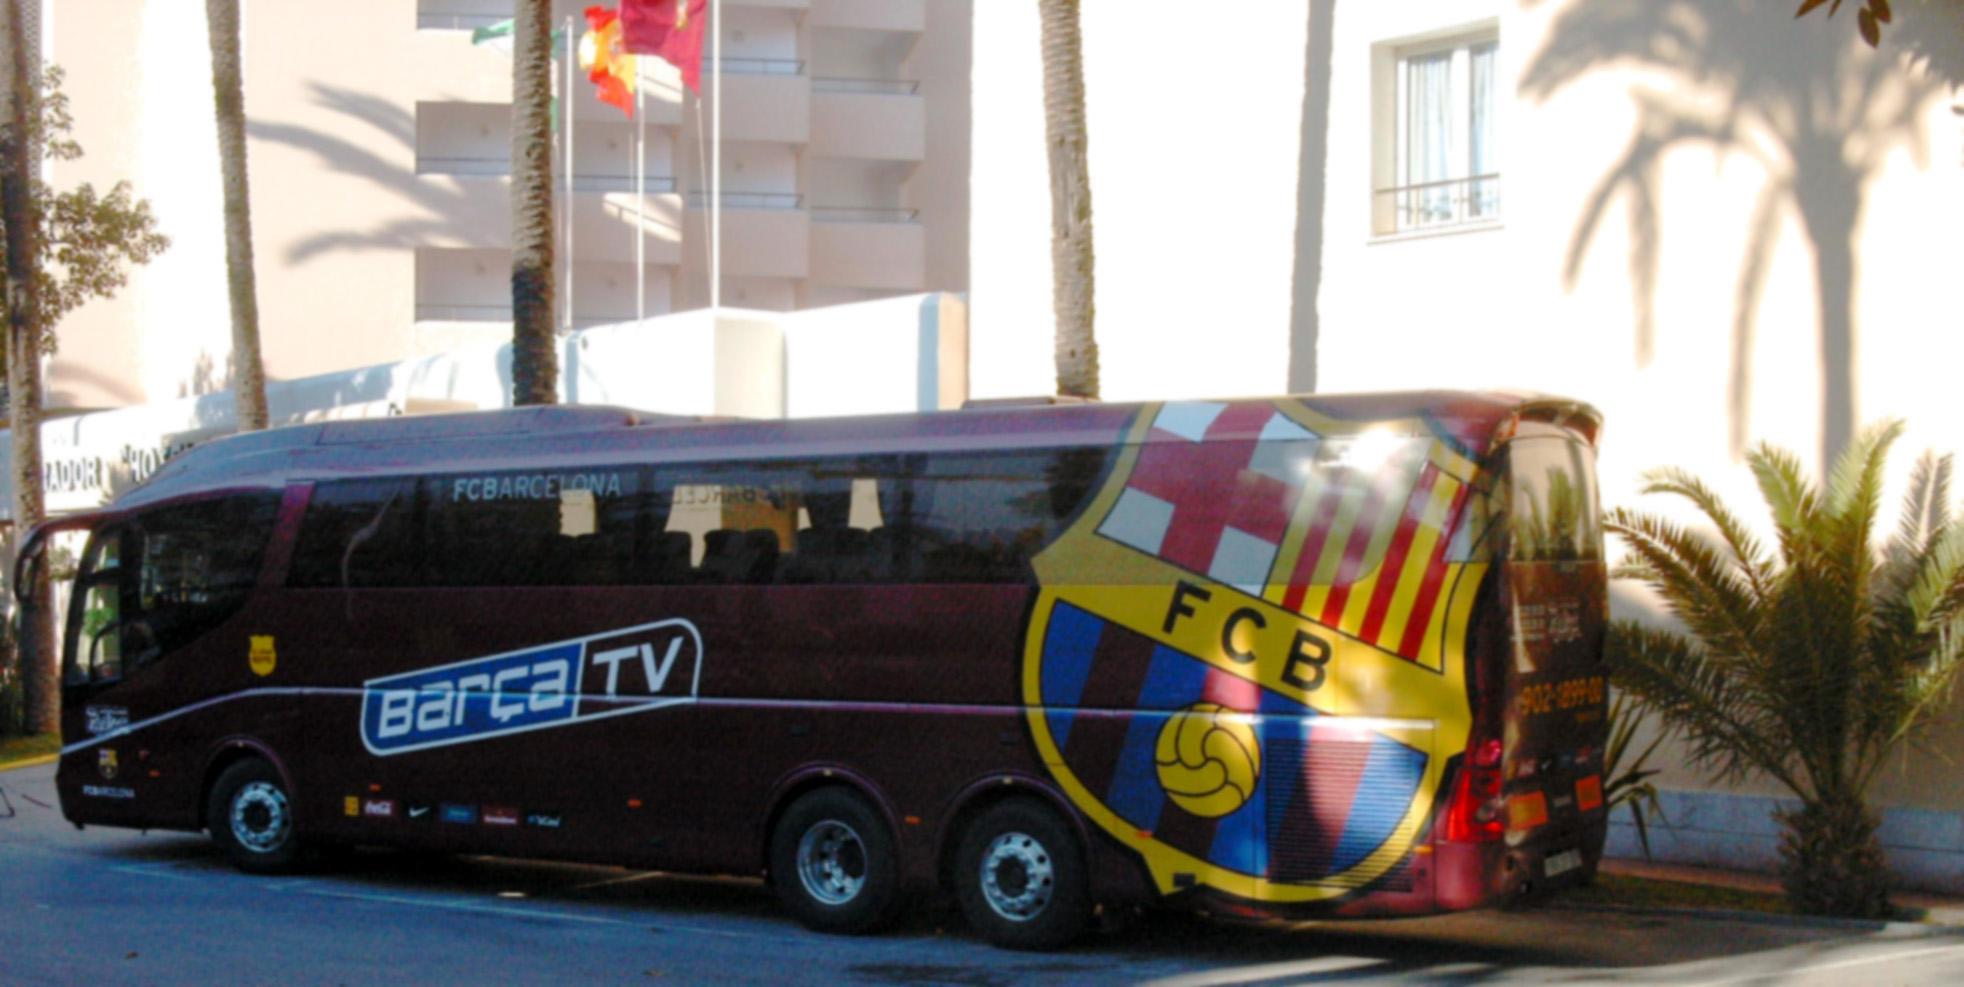 Fußball: Mannschaftsbus des FC Barcelona